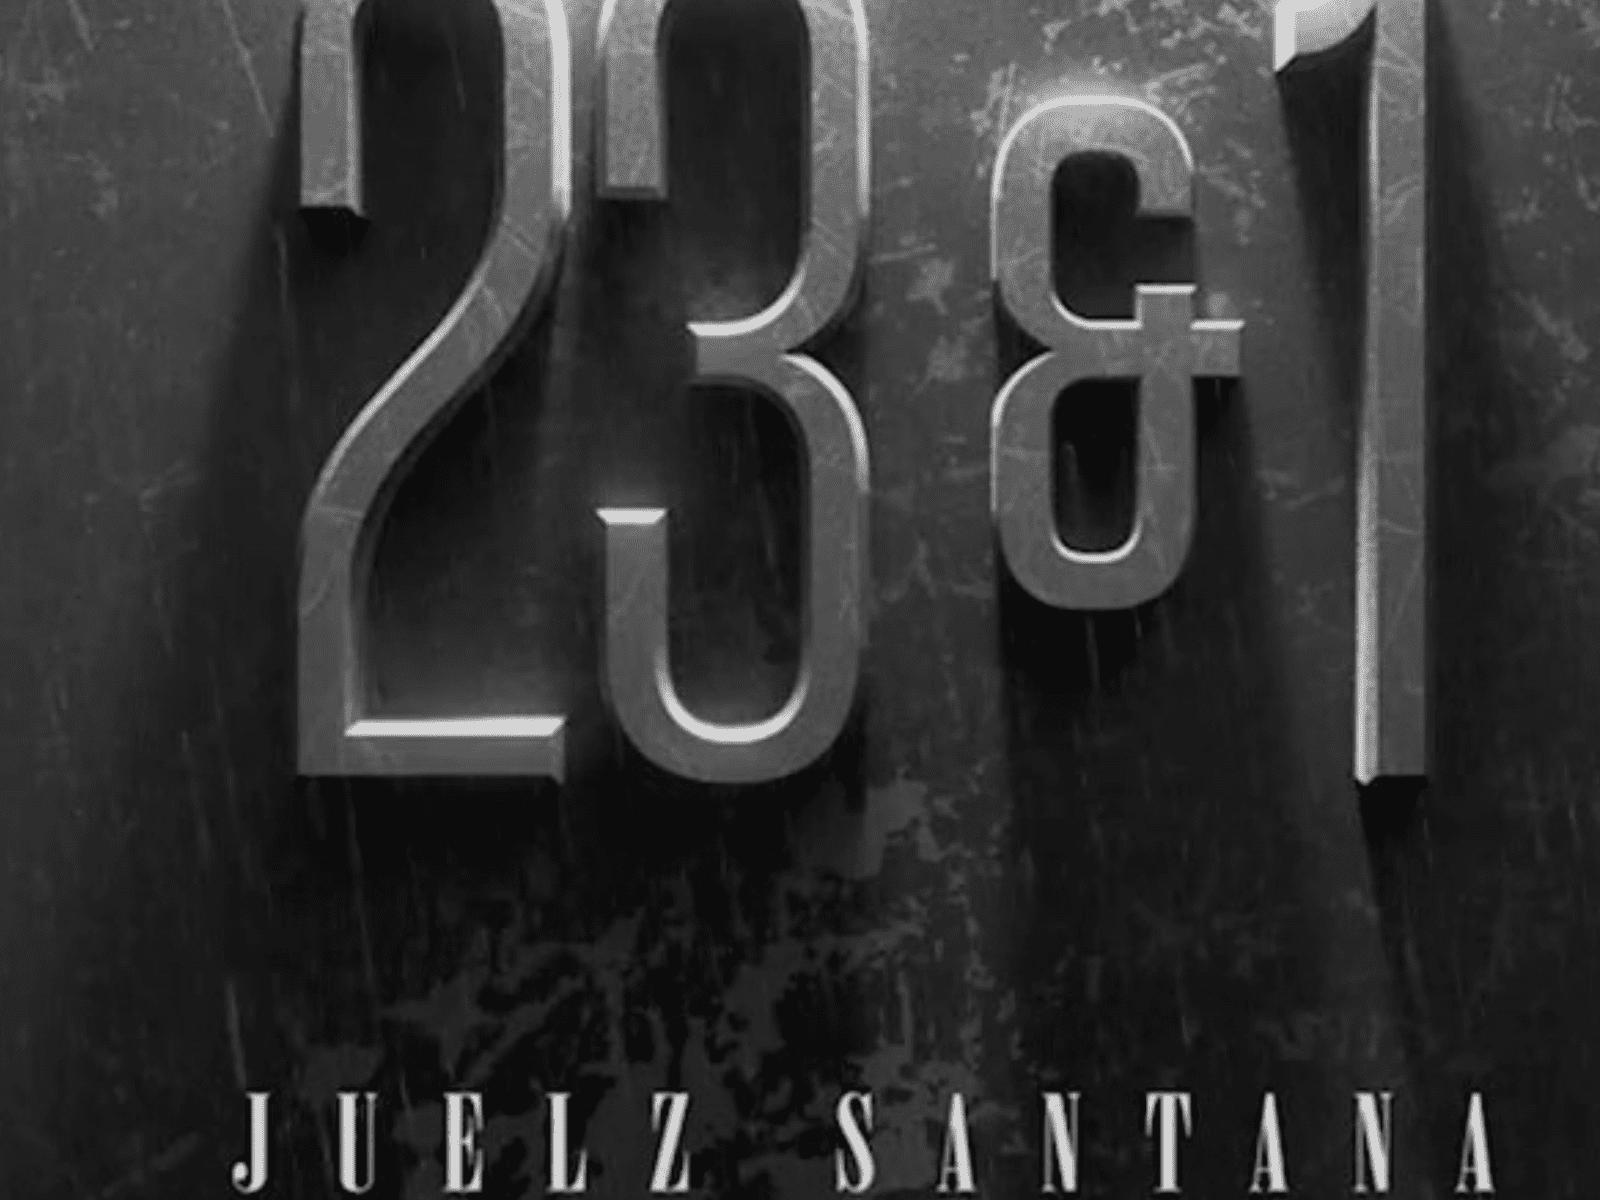 Juelz Santana 23 and 1